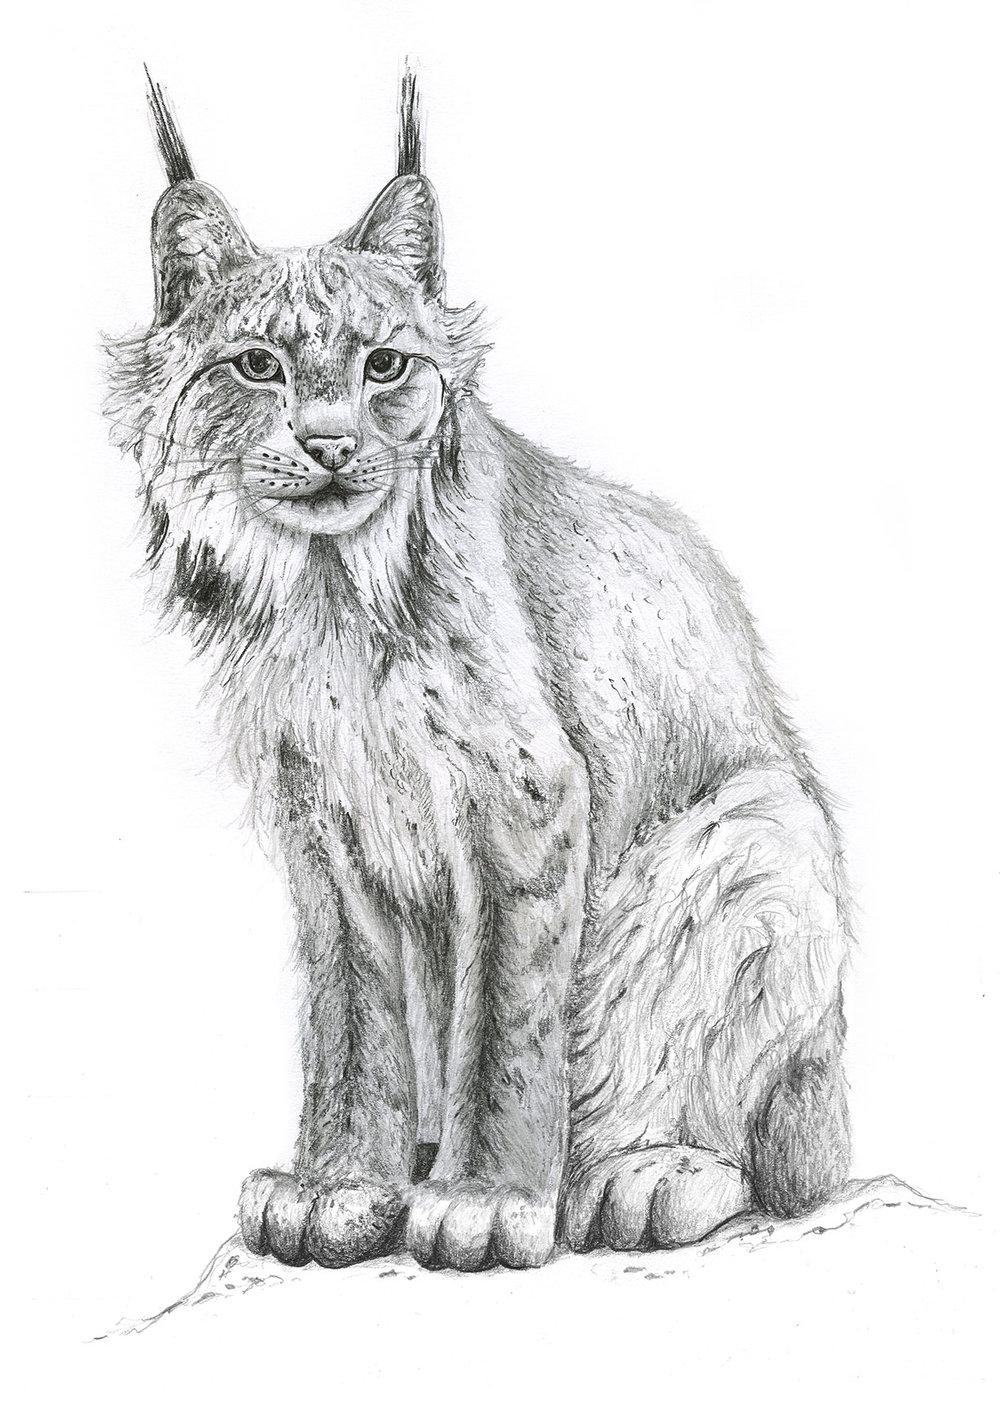 Lynx by LK Weiss